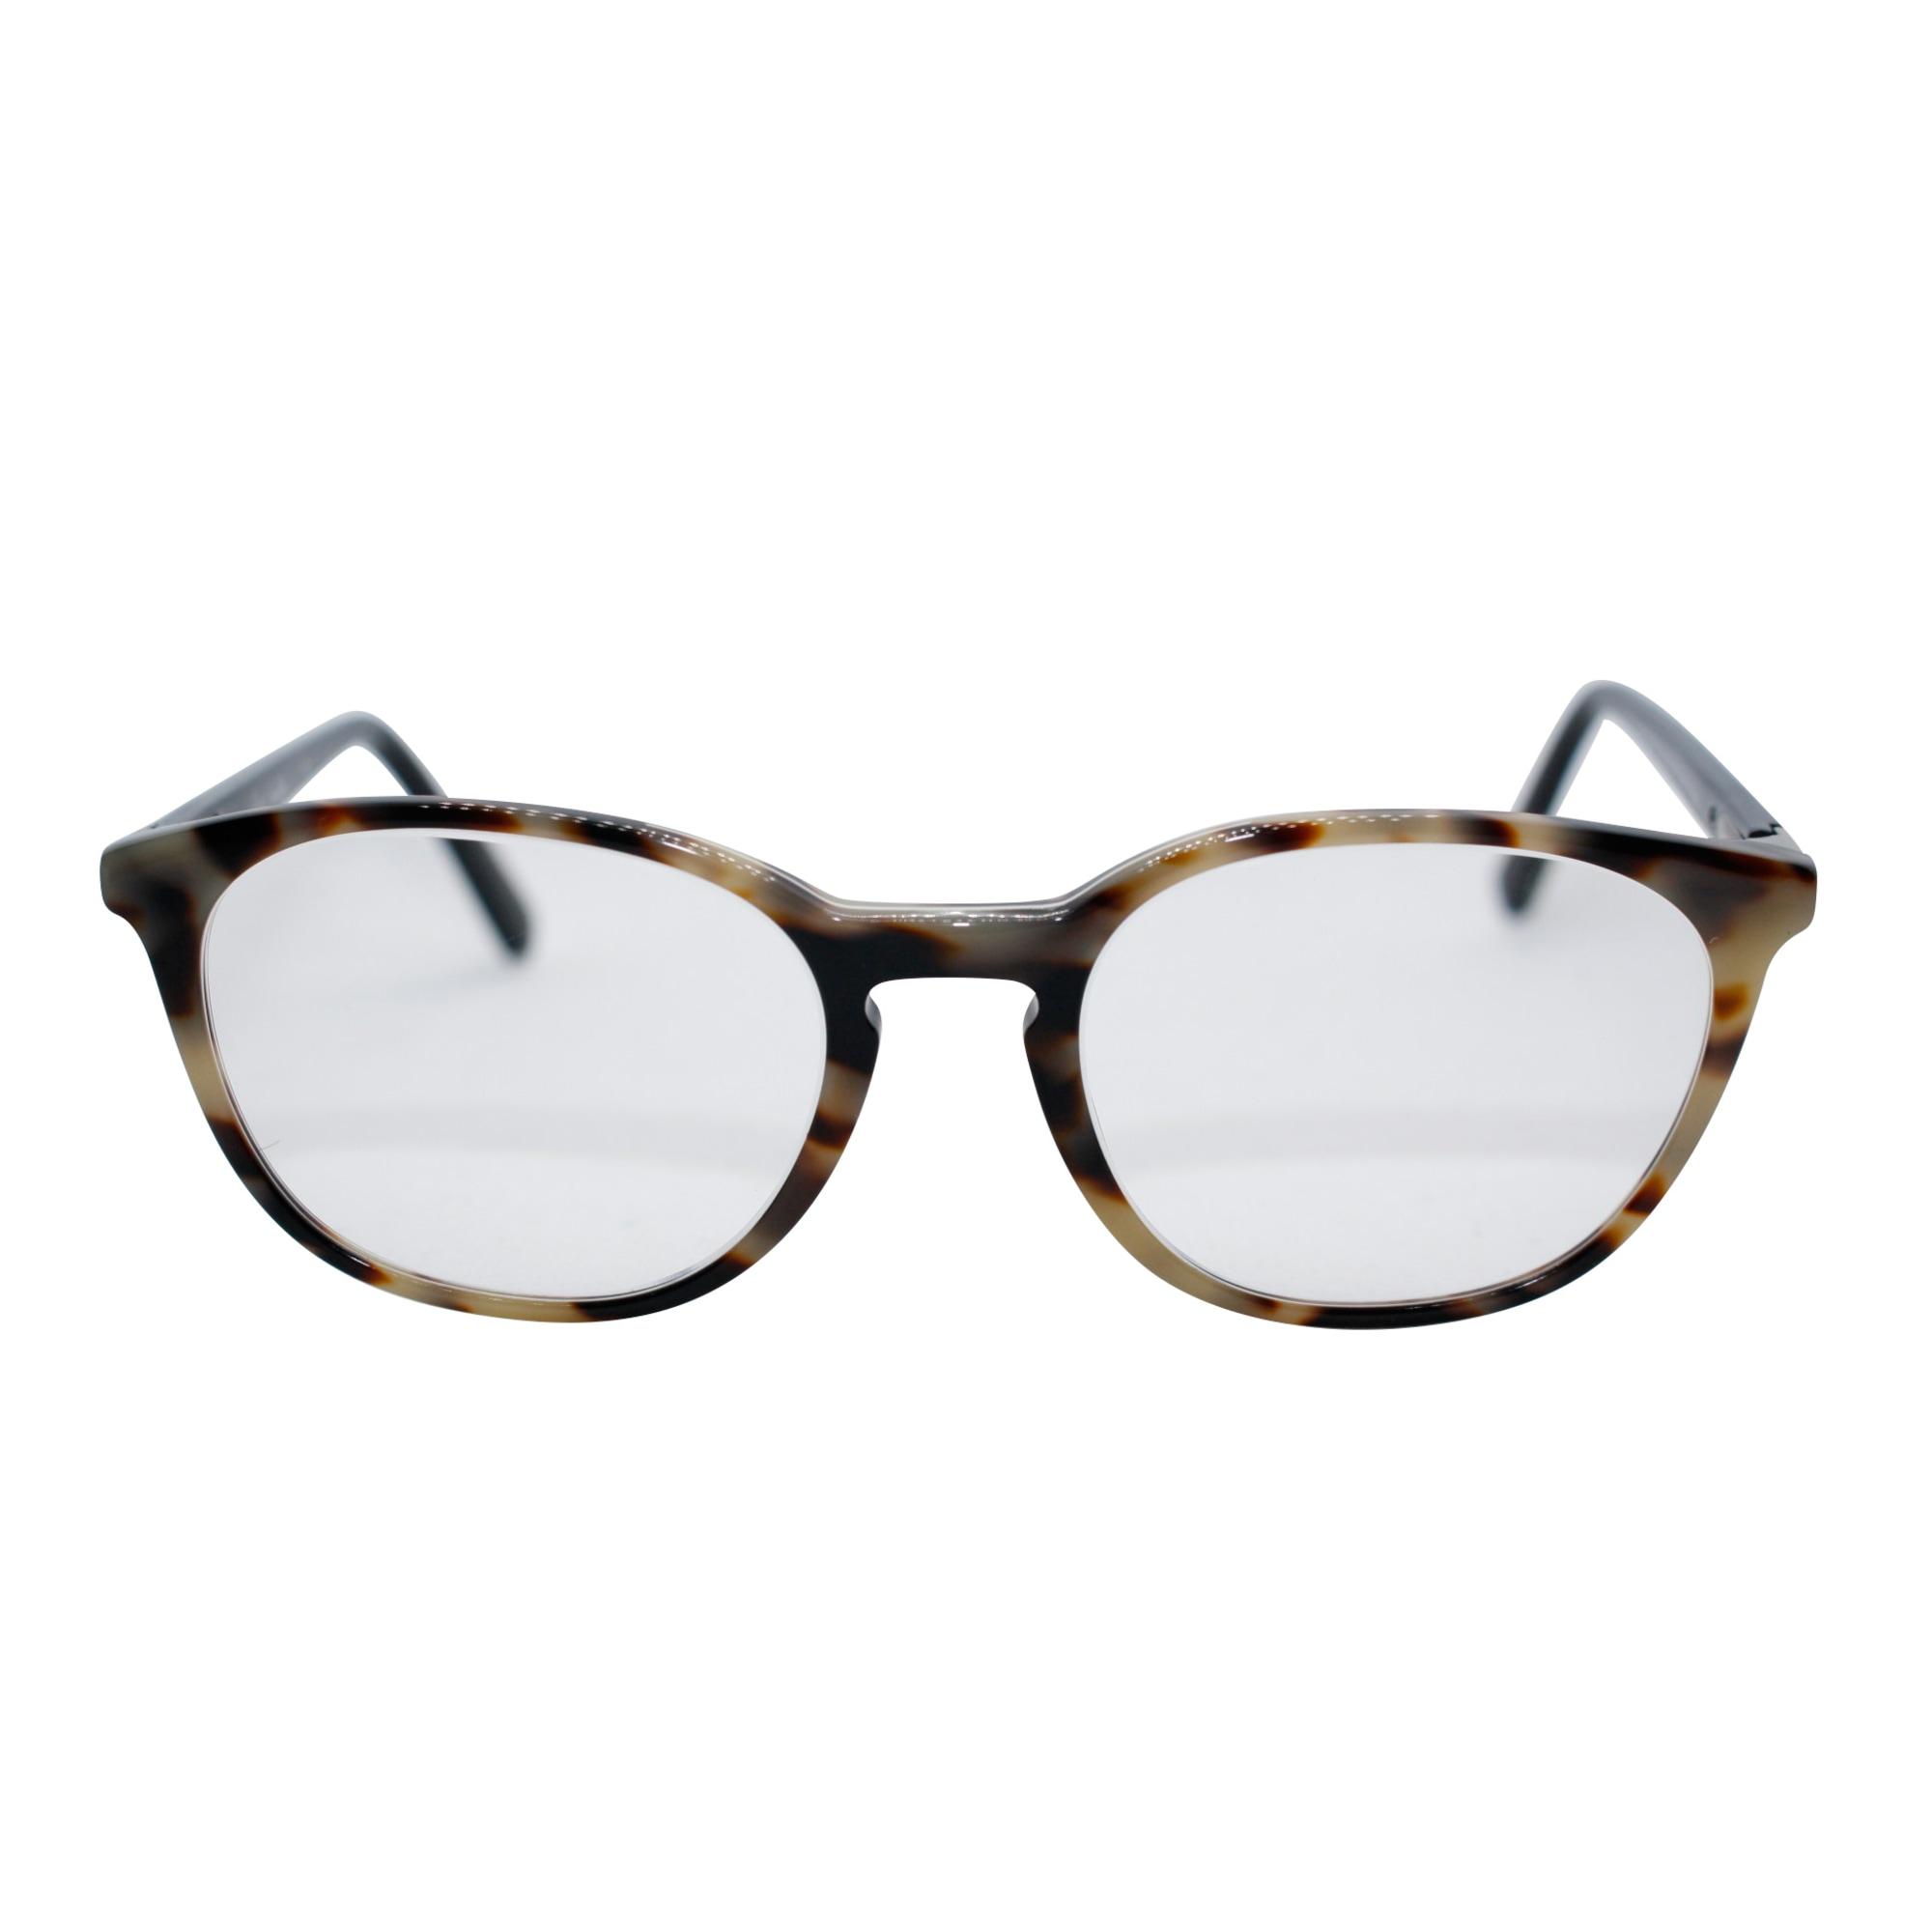 Eyeglass Frames MAUBOUSSIN Noir intense et pièce en nacre blanc perle